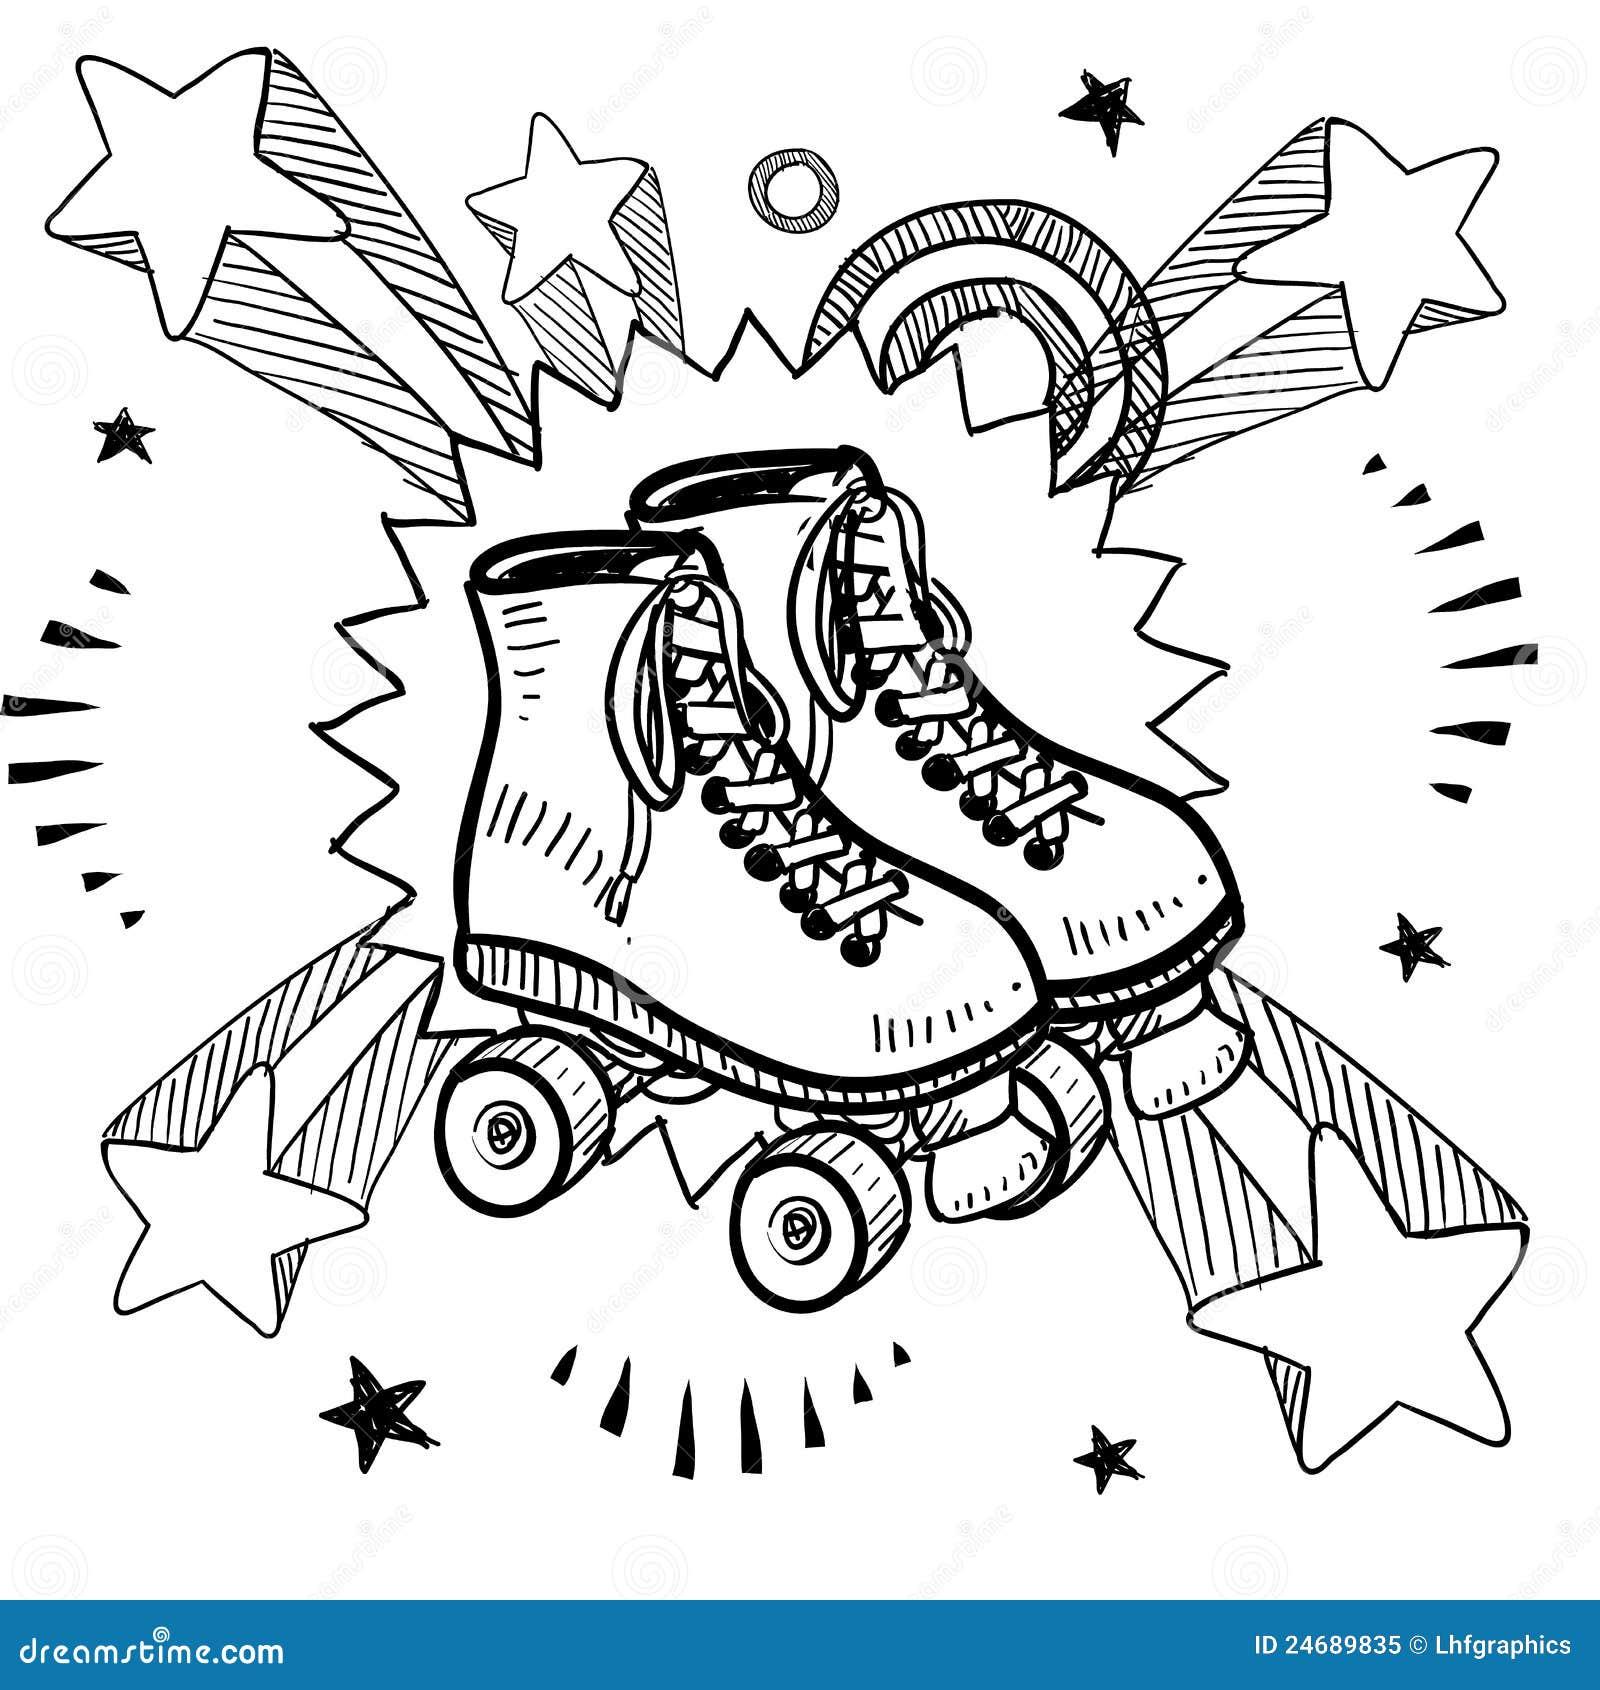 Roller Skating Sketch Royalty Free Stock Photo Image